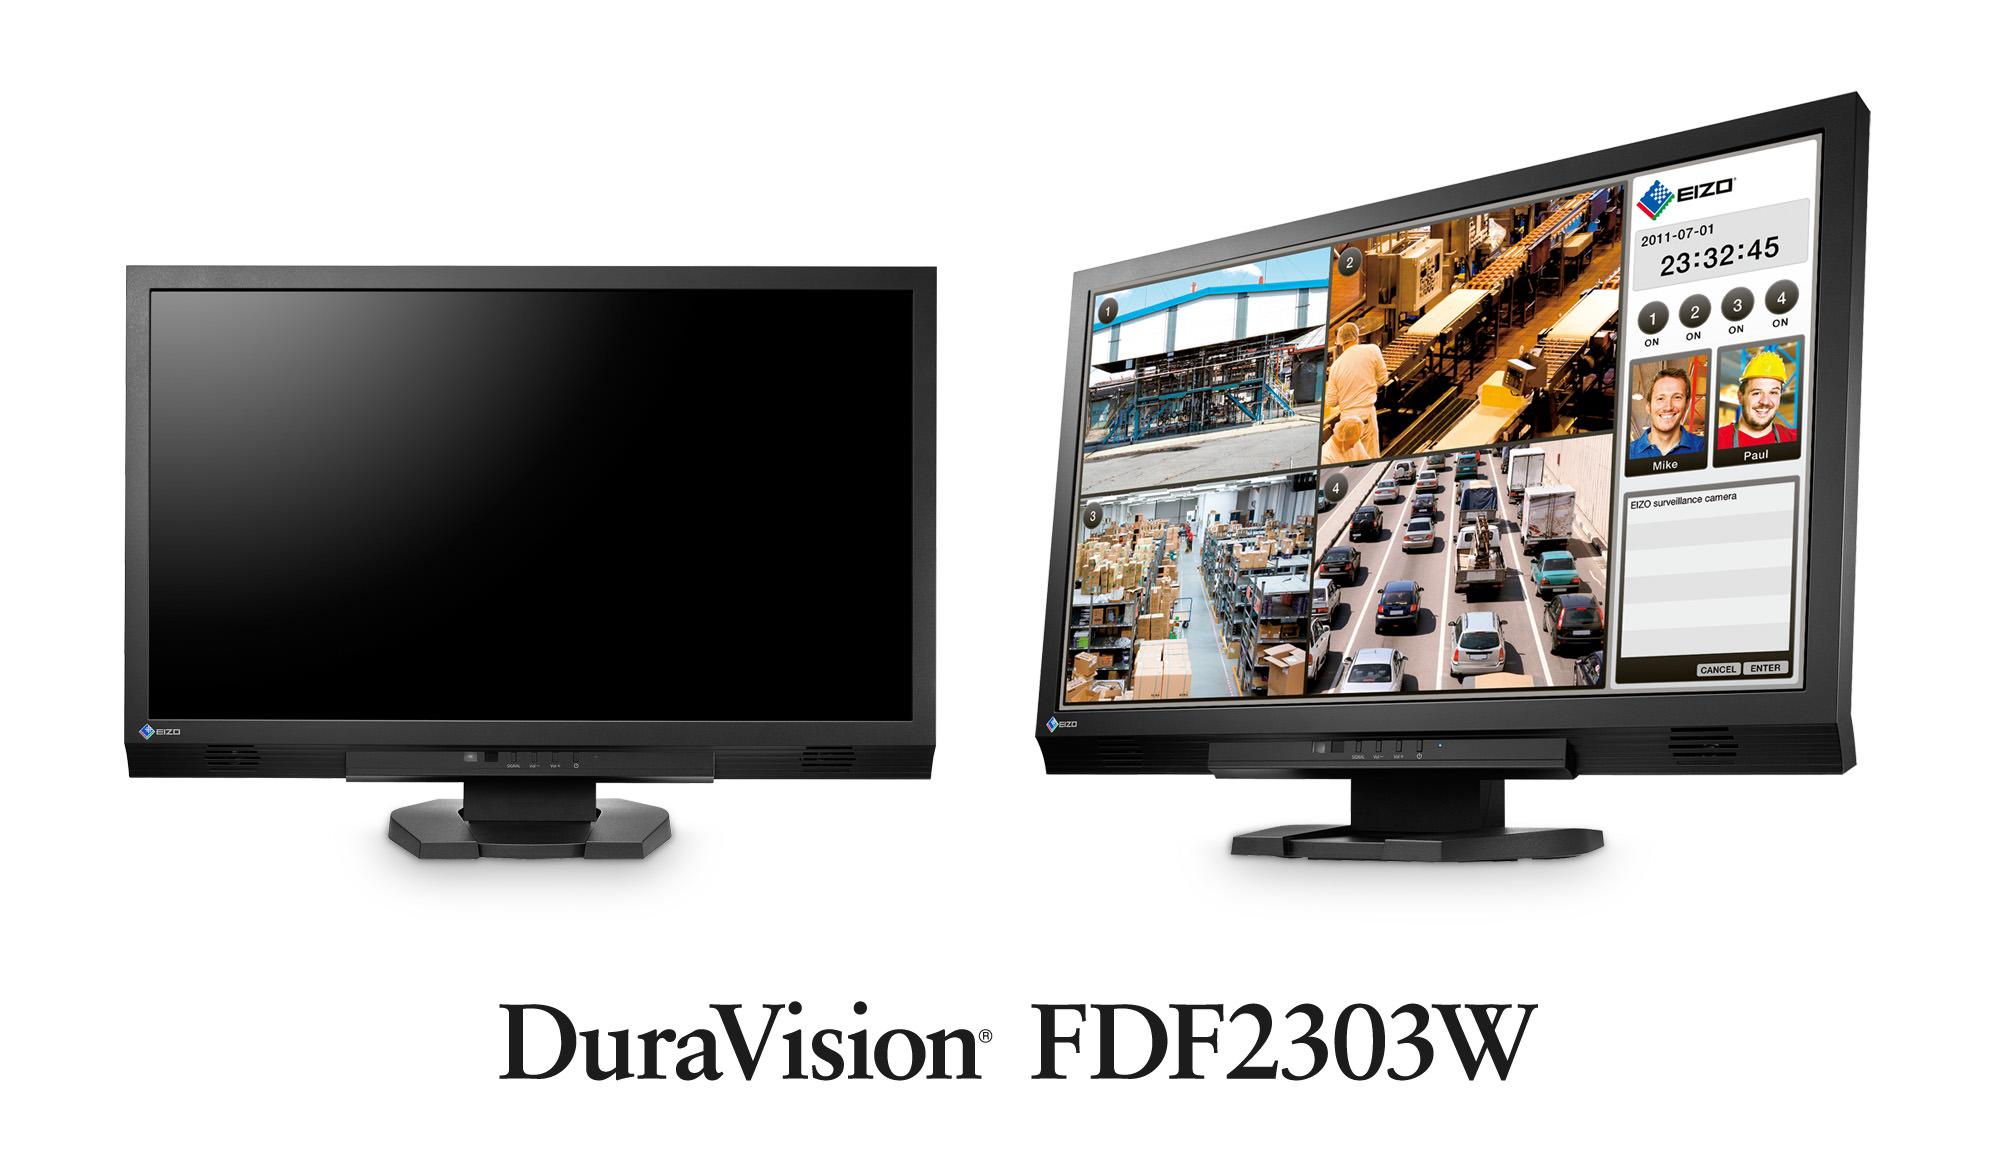 DuraVision_FDF2303W